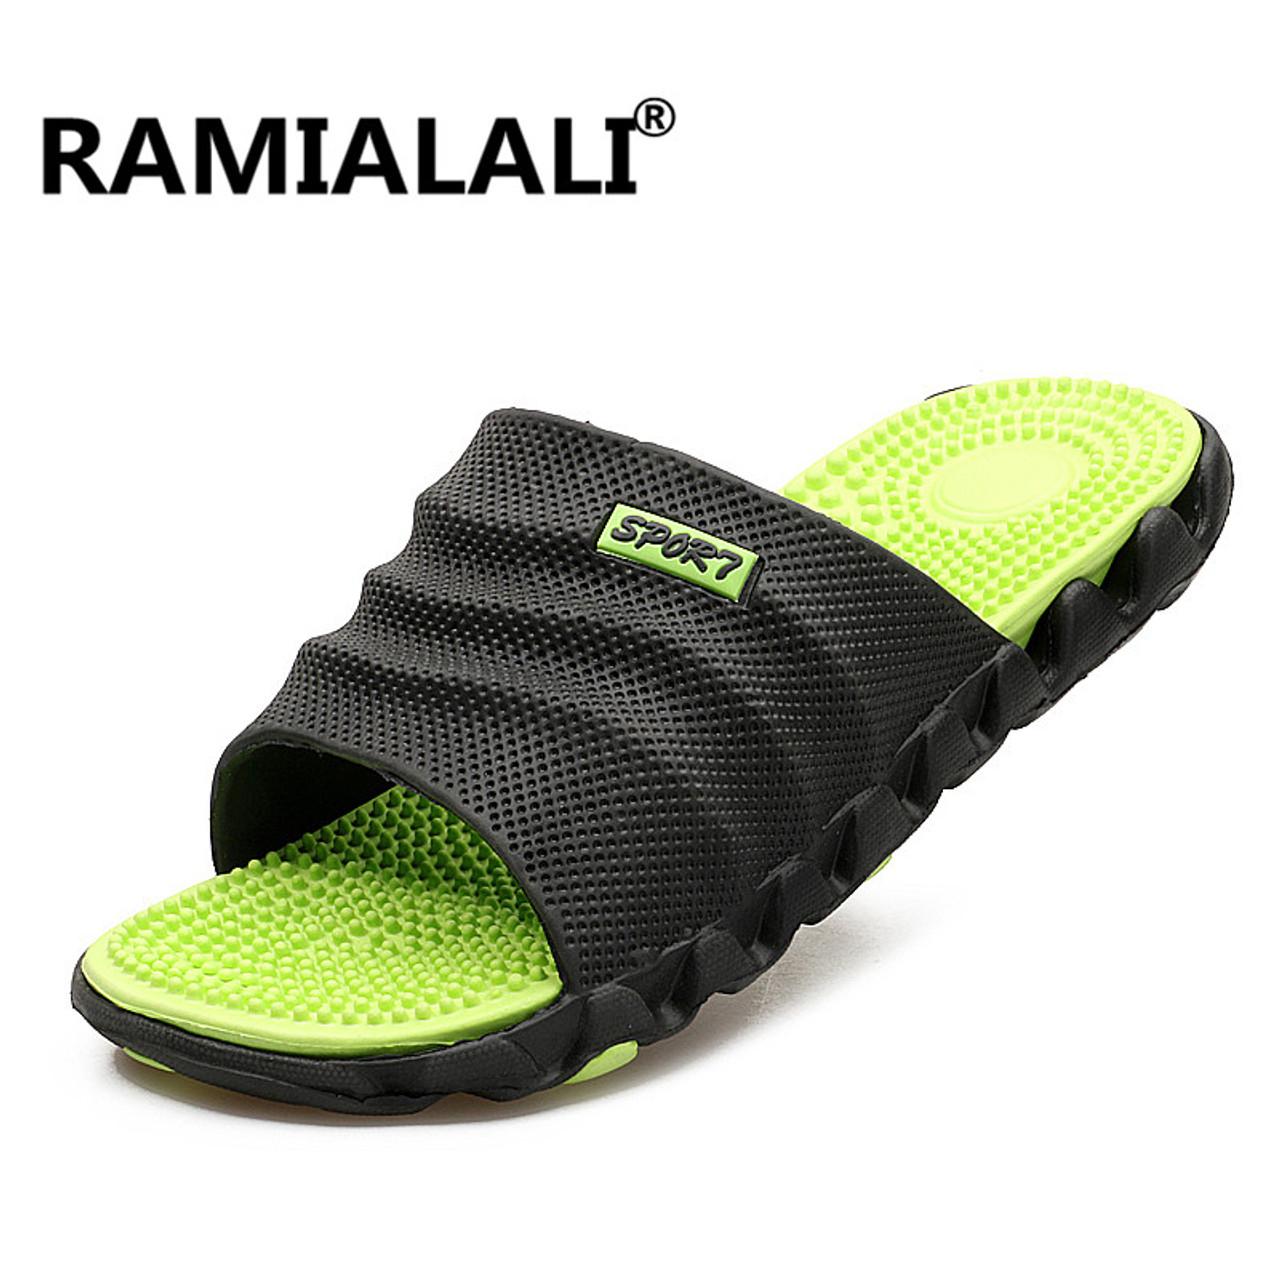 5b7b78708c64f ... Ramialali Summer Slippers Men Casual Sandals Leisure Soft Slides Eva  Massage Beach Slippers Water Shoes Men's ...